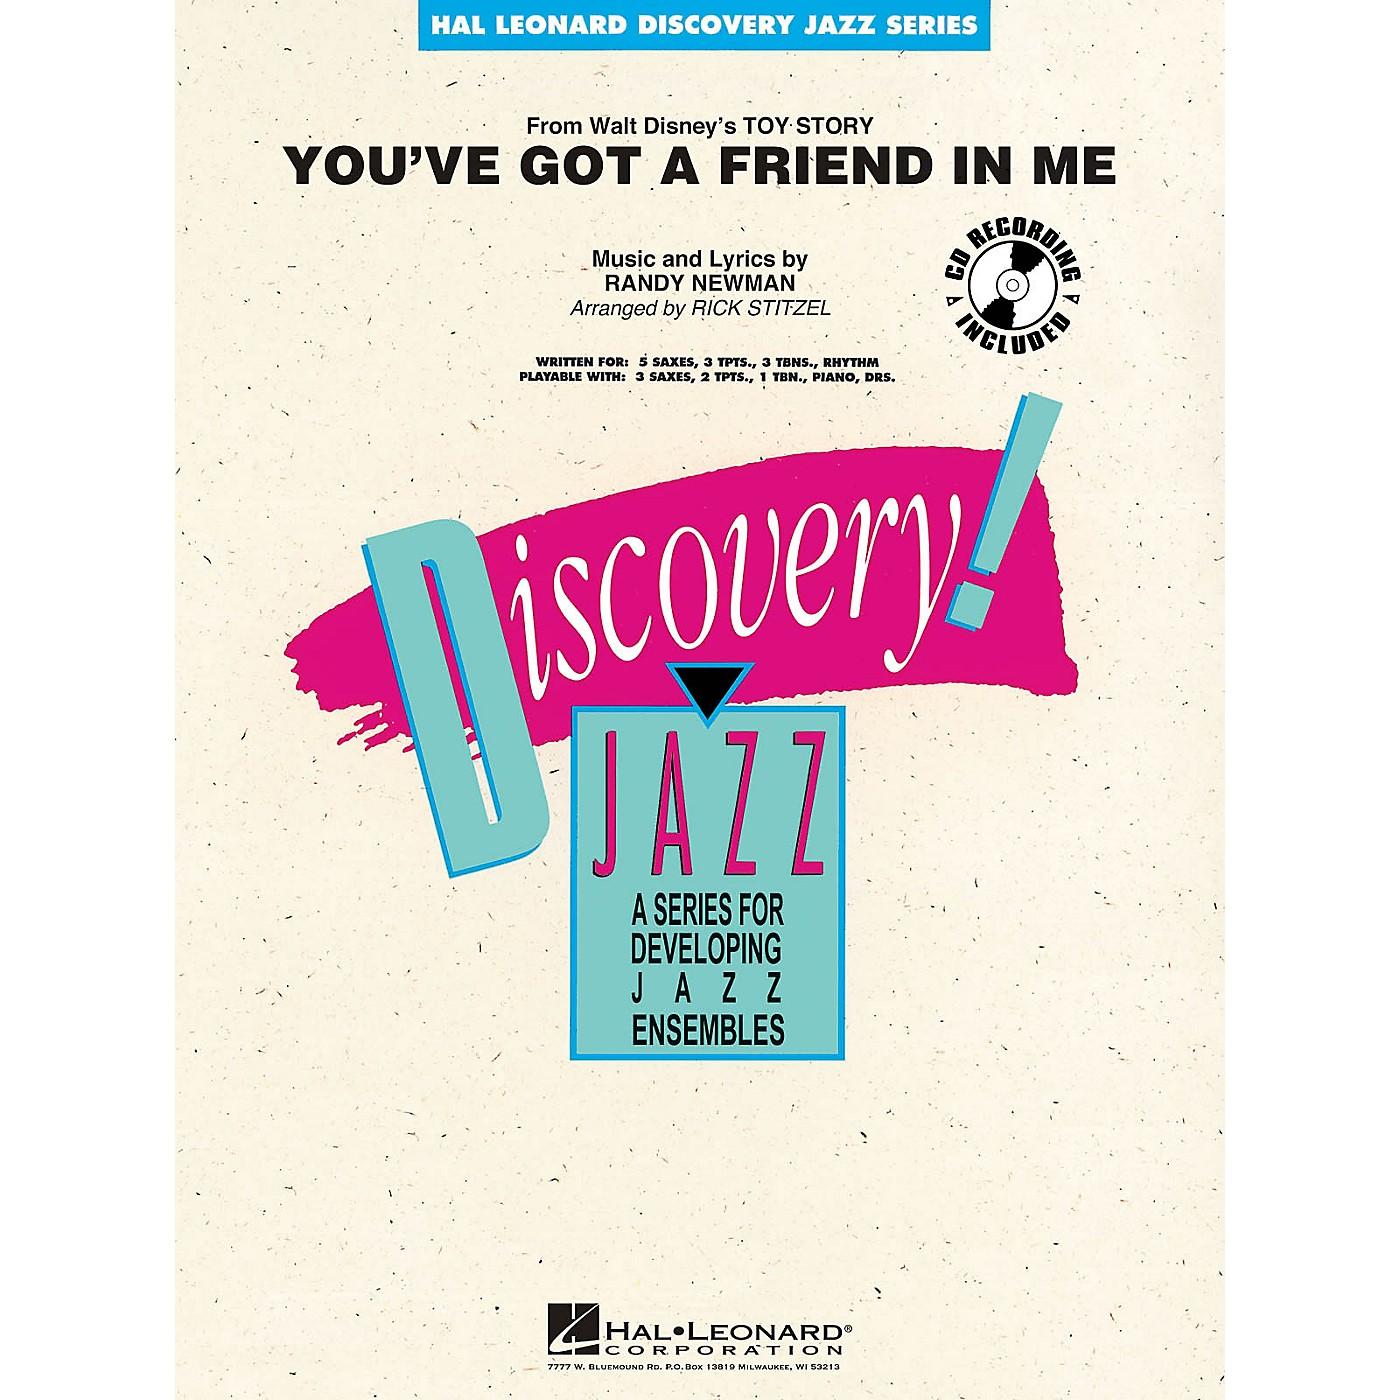 Hal Leonard You've Got a Friend in Me Jazz Band Level 1-2 Arranged by Rick Stitzel thumbnail